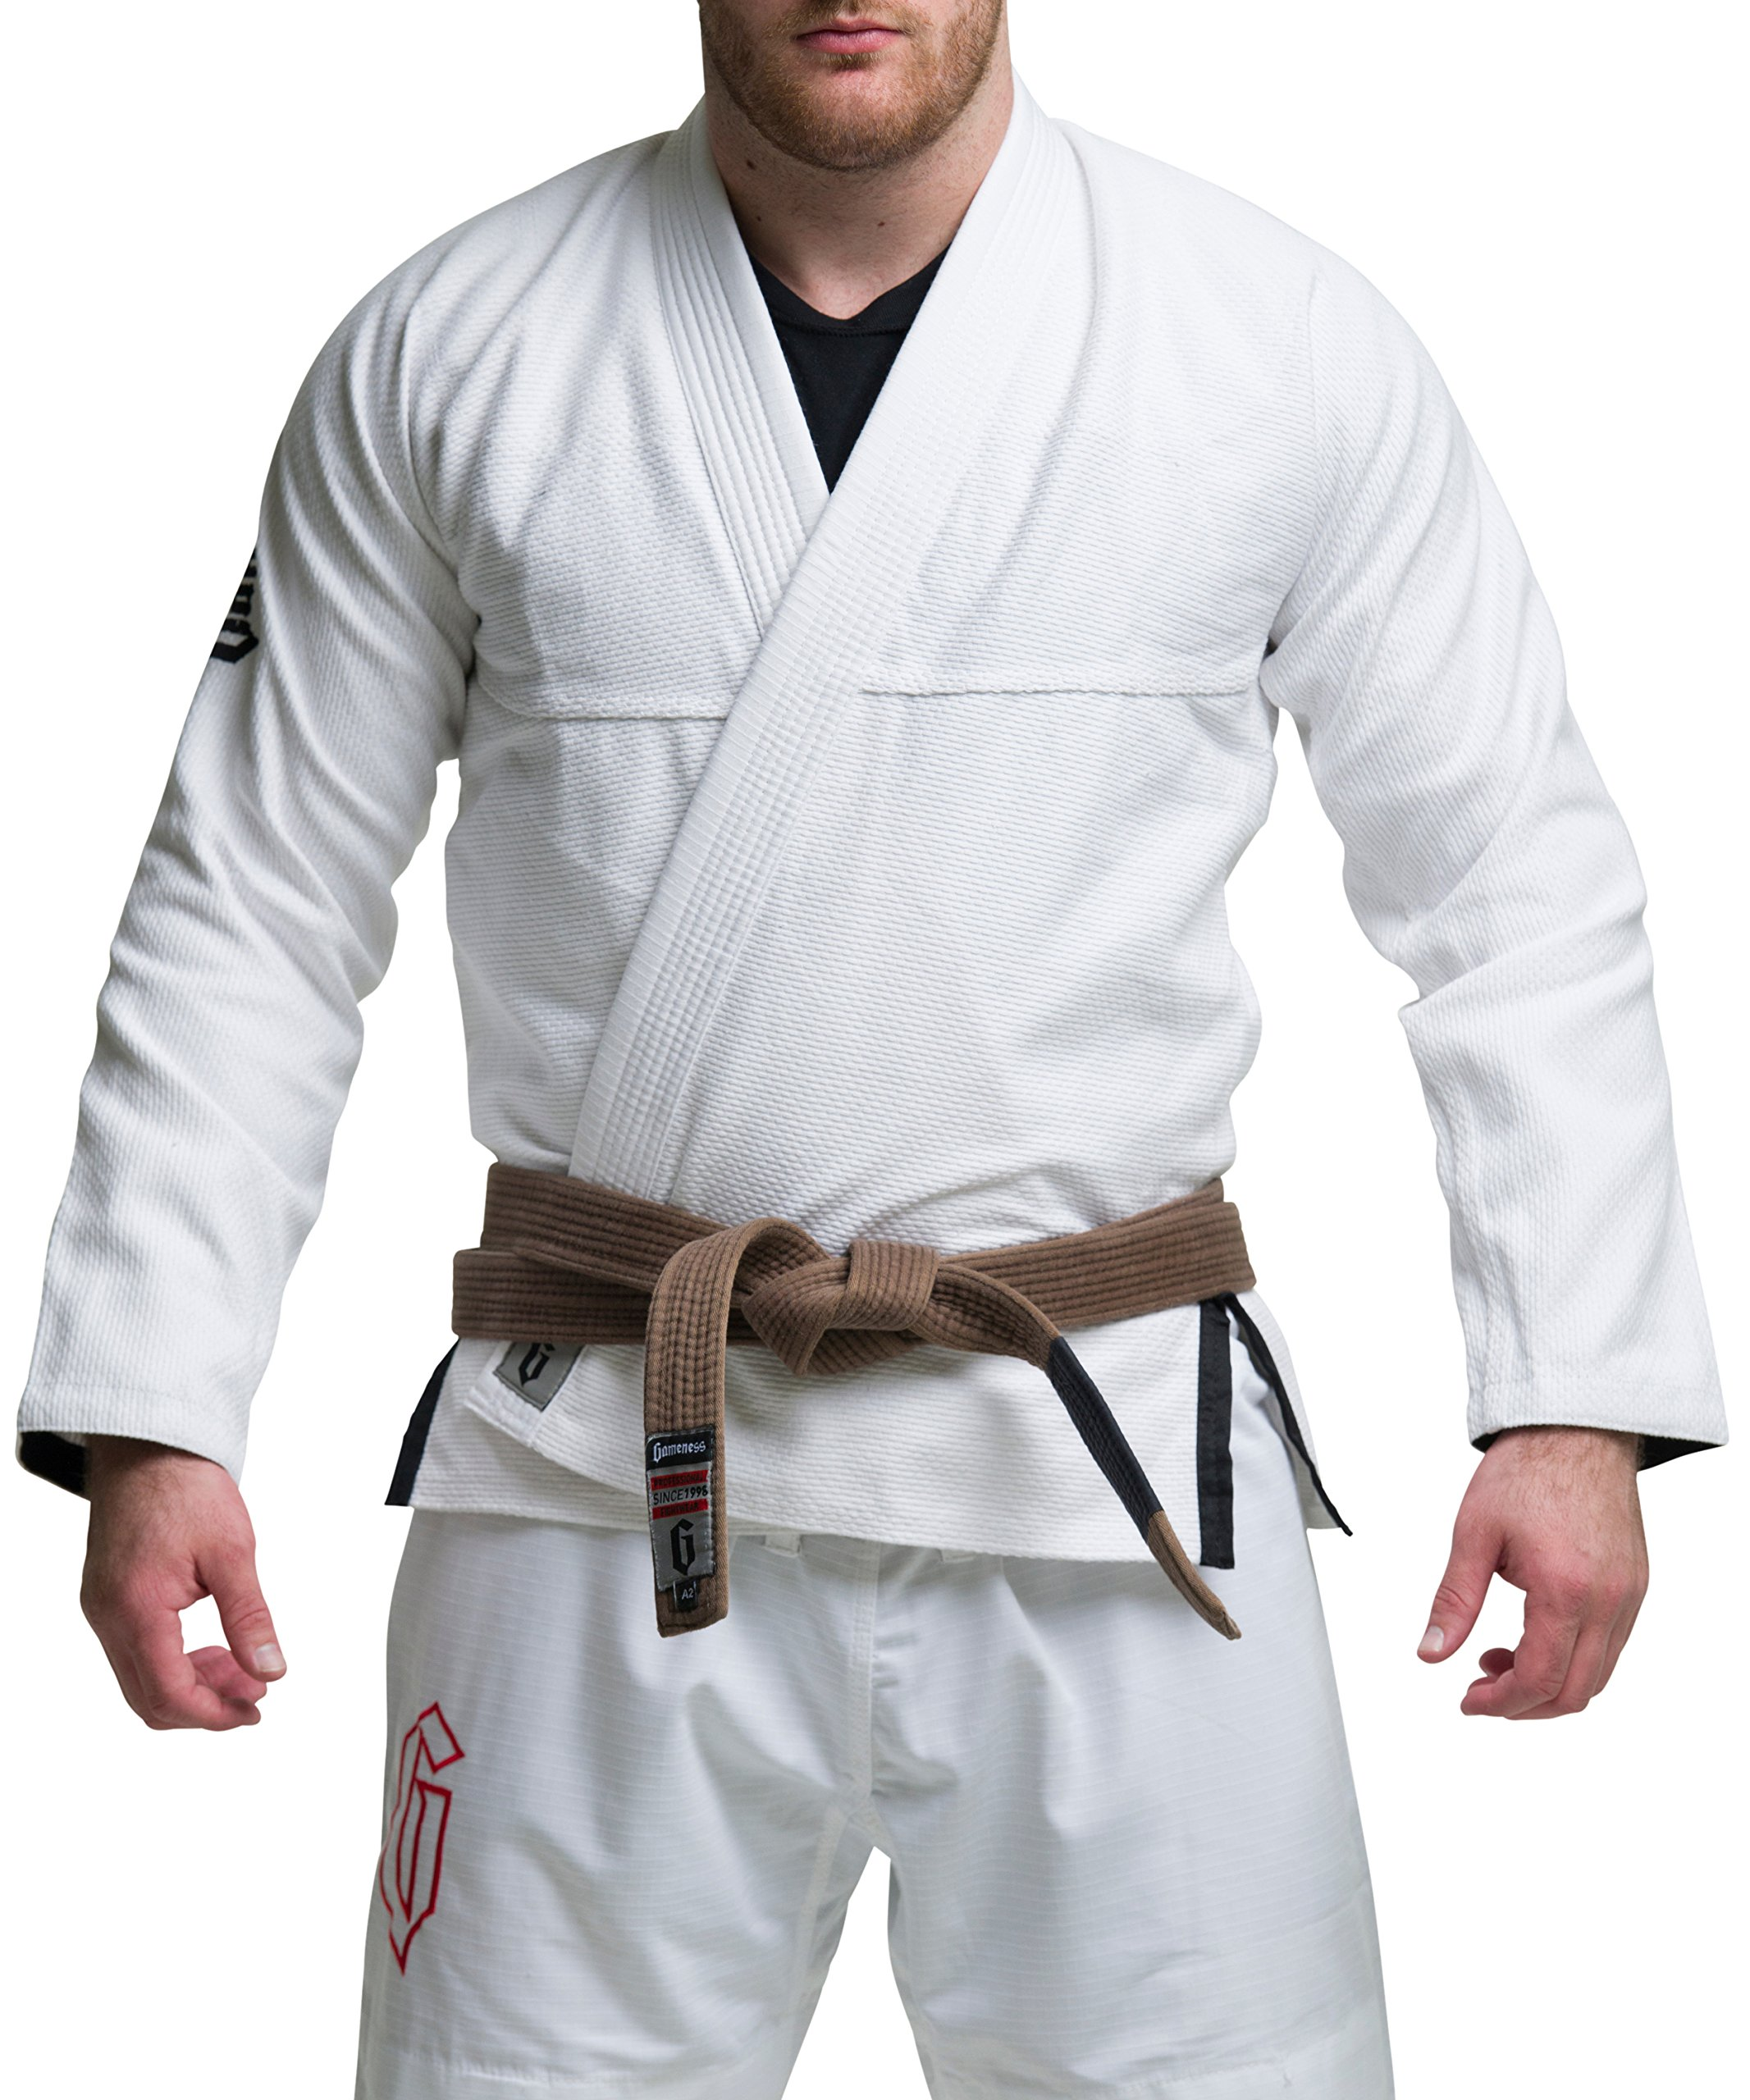 Gameness Jiu Jitsu Air Gi White A1 by Gameness